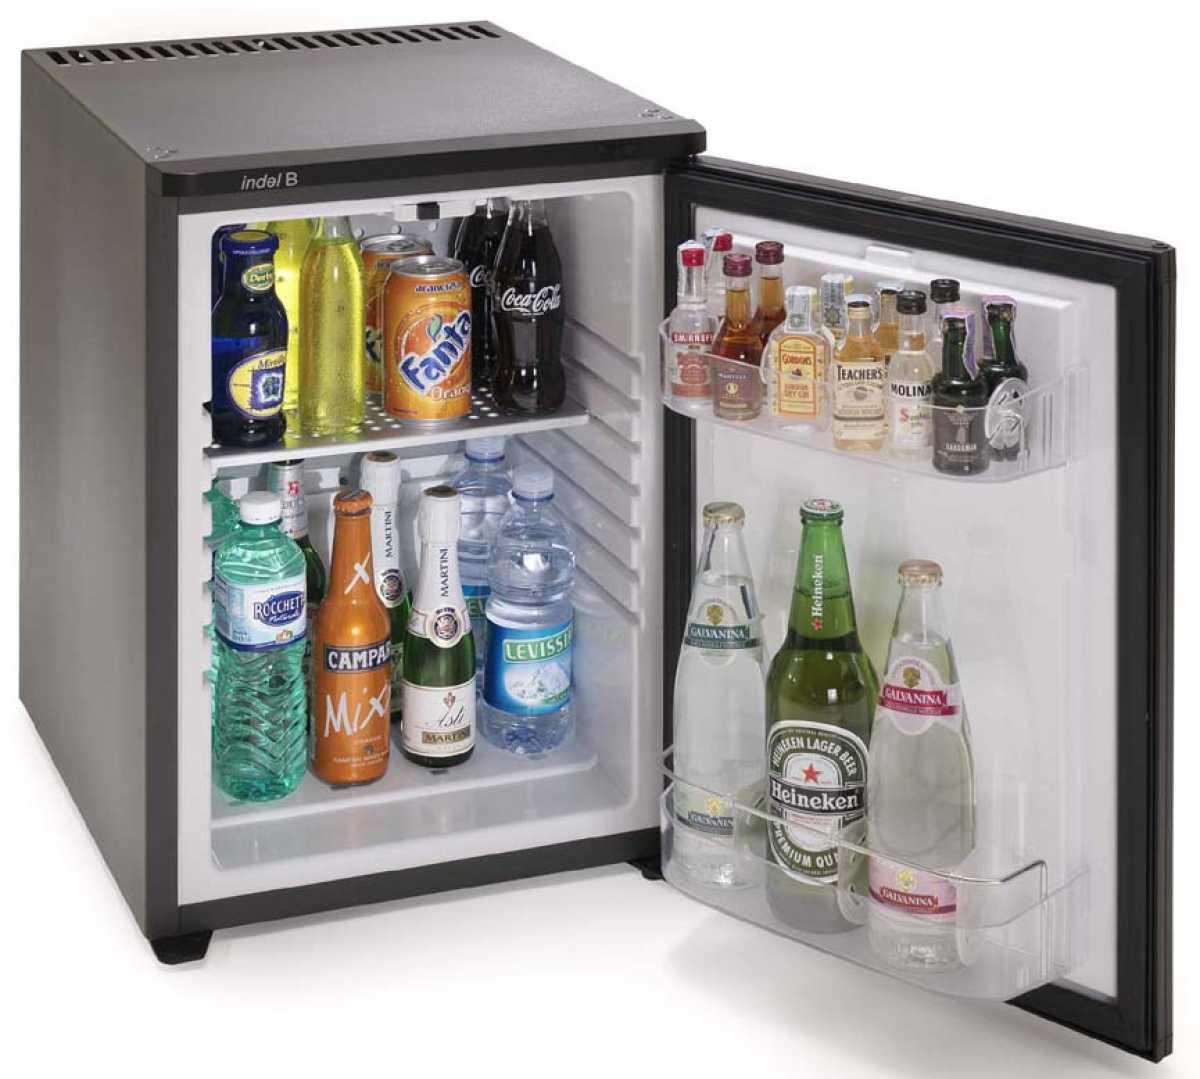 INDEL B K 40 Ecosmart Minibar